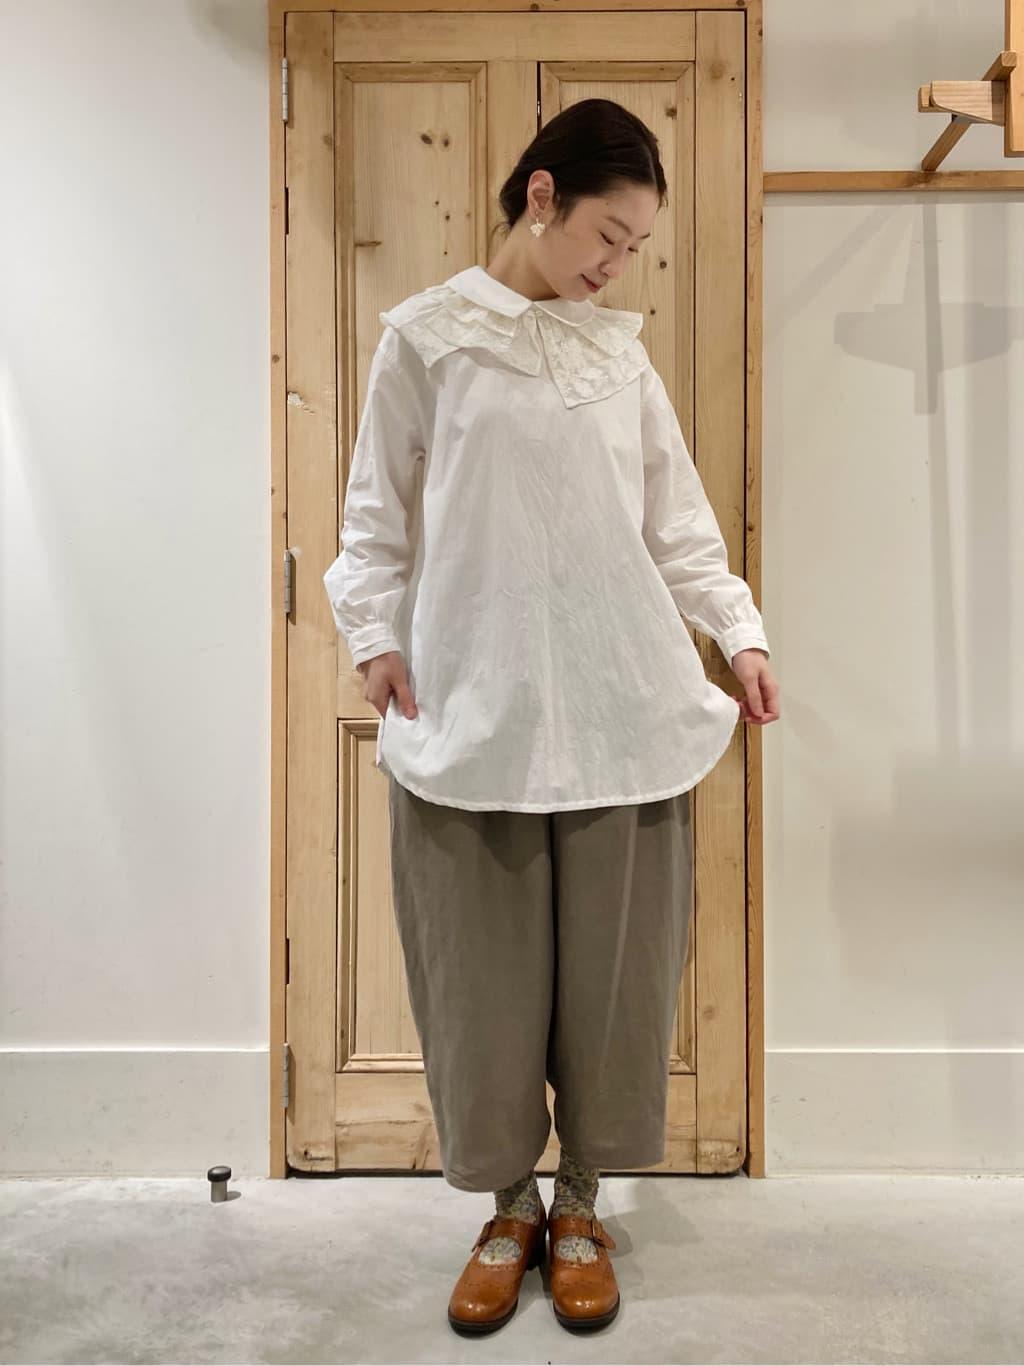 Malle chambre de charme 調布パルコ 身長:162cm 2021.08.27